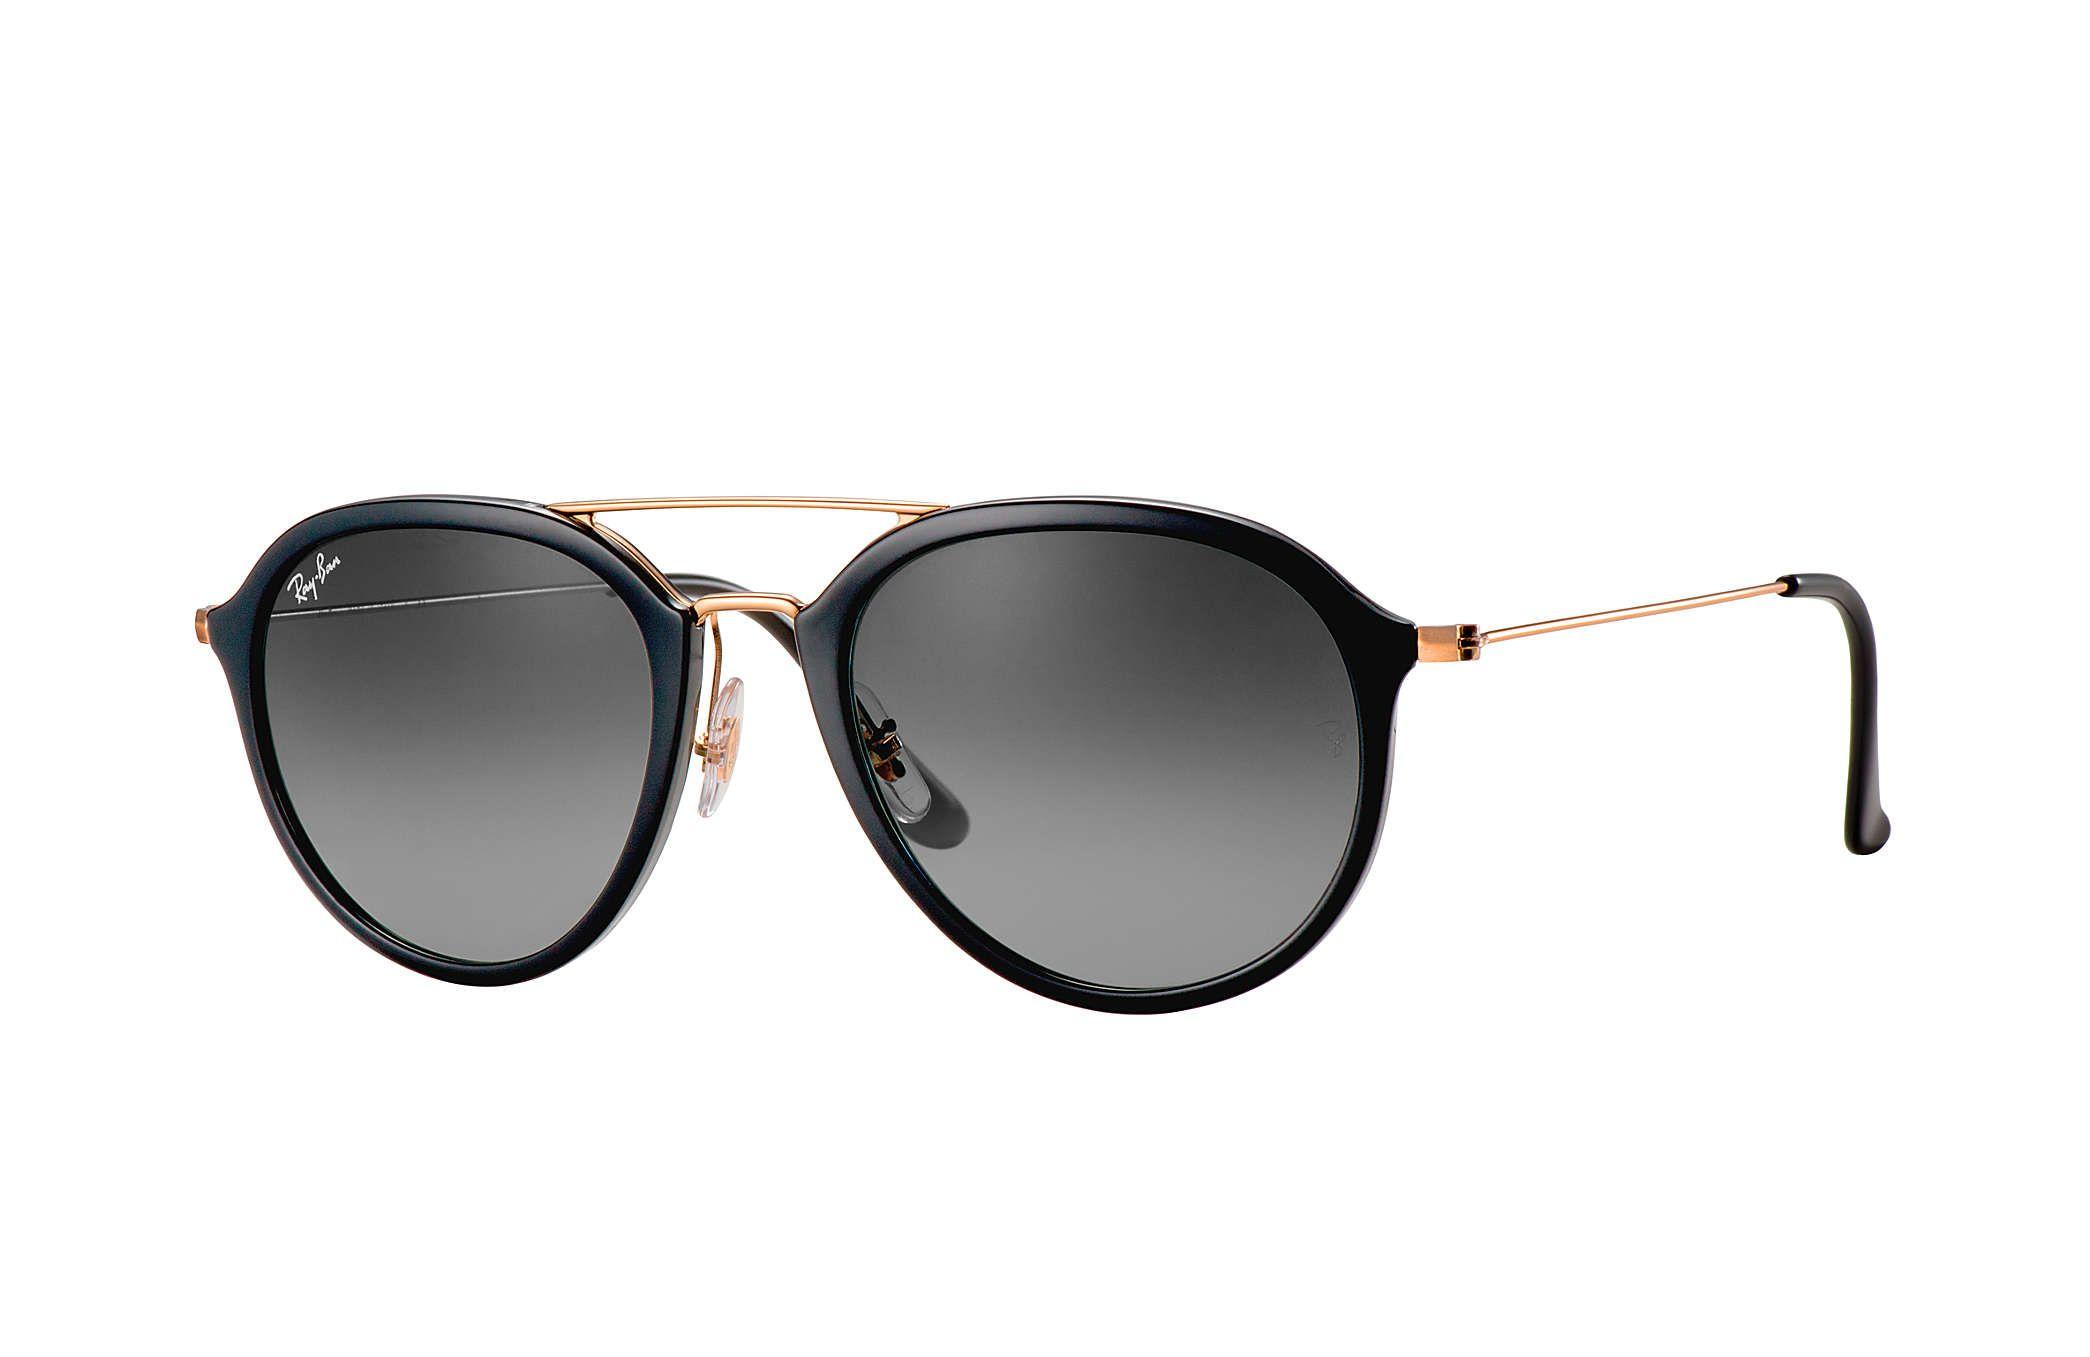 d8edc96a97870 Luxottica S.p.A in 2018   Accessories   Pinterest   Sunglasses, Ray ...